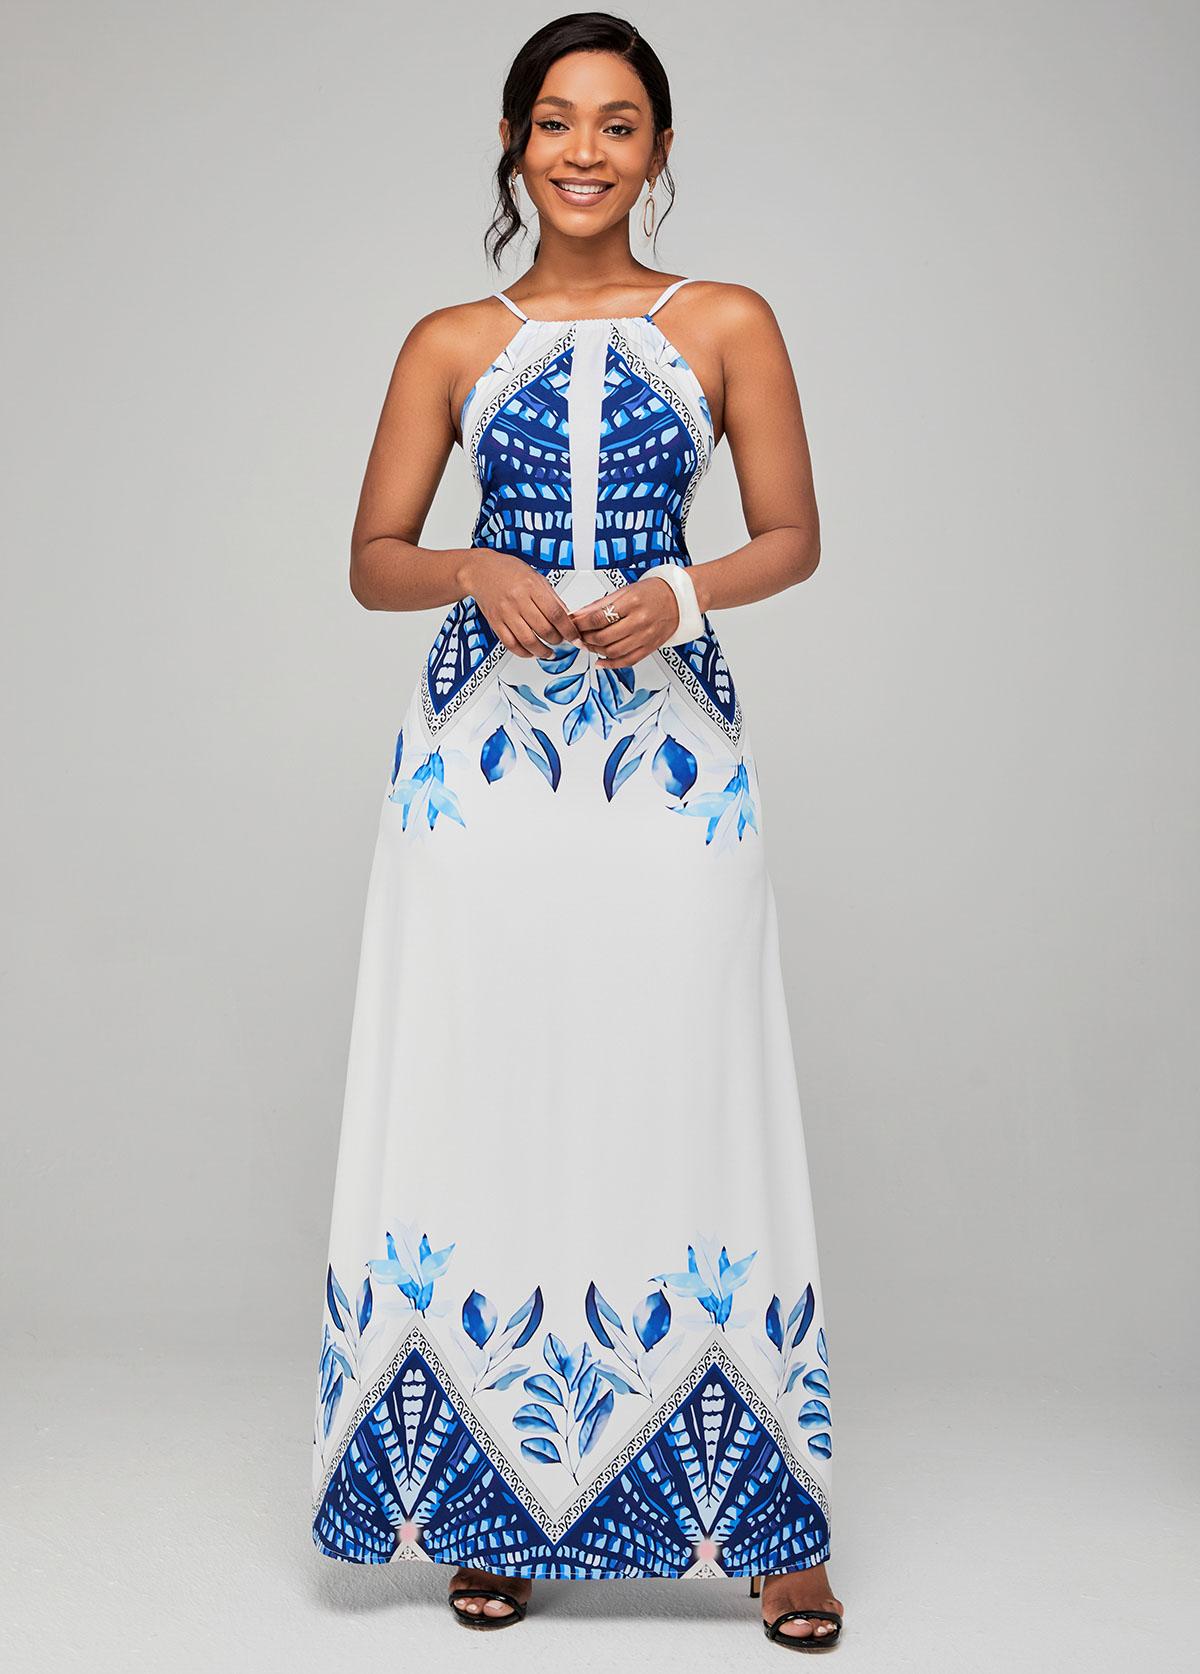 Tribal Print Spaghetti Strap High Waist Dress